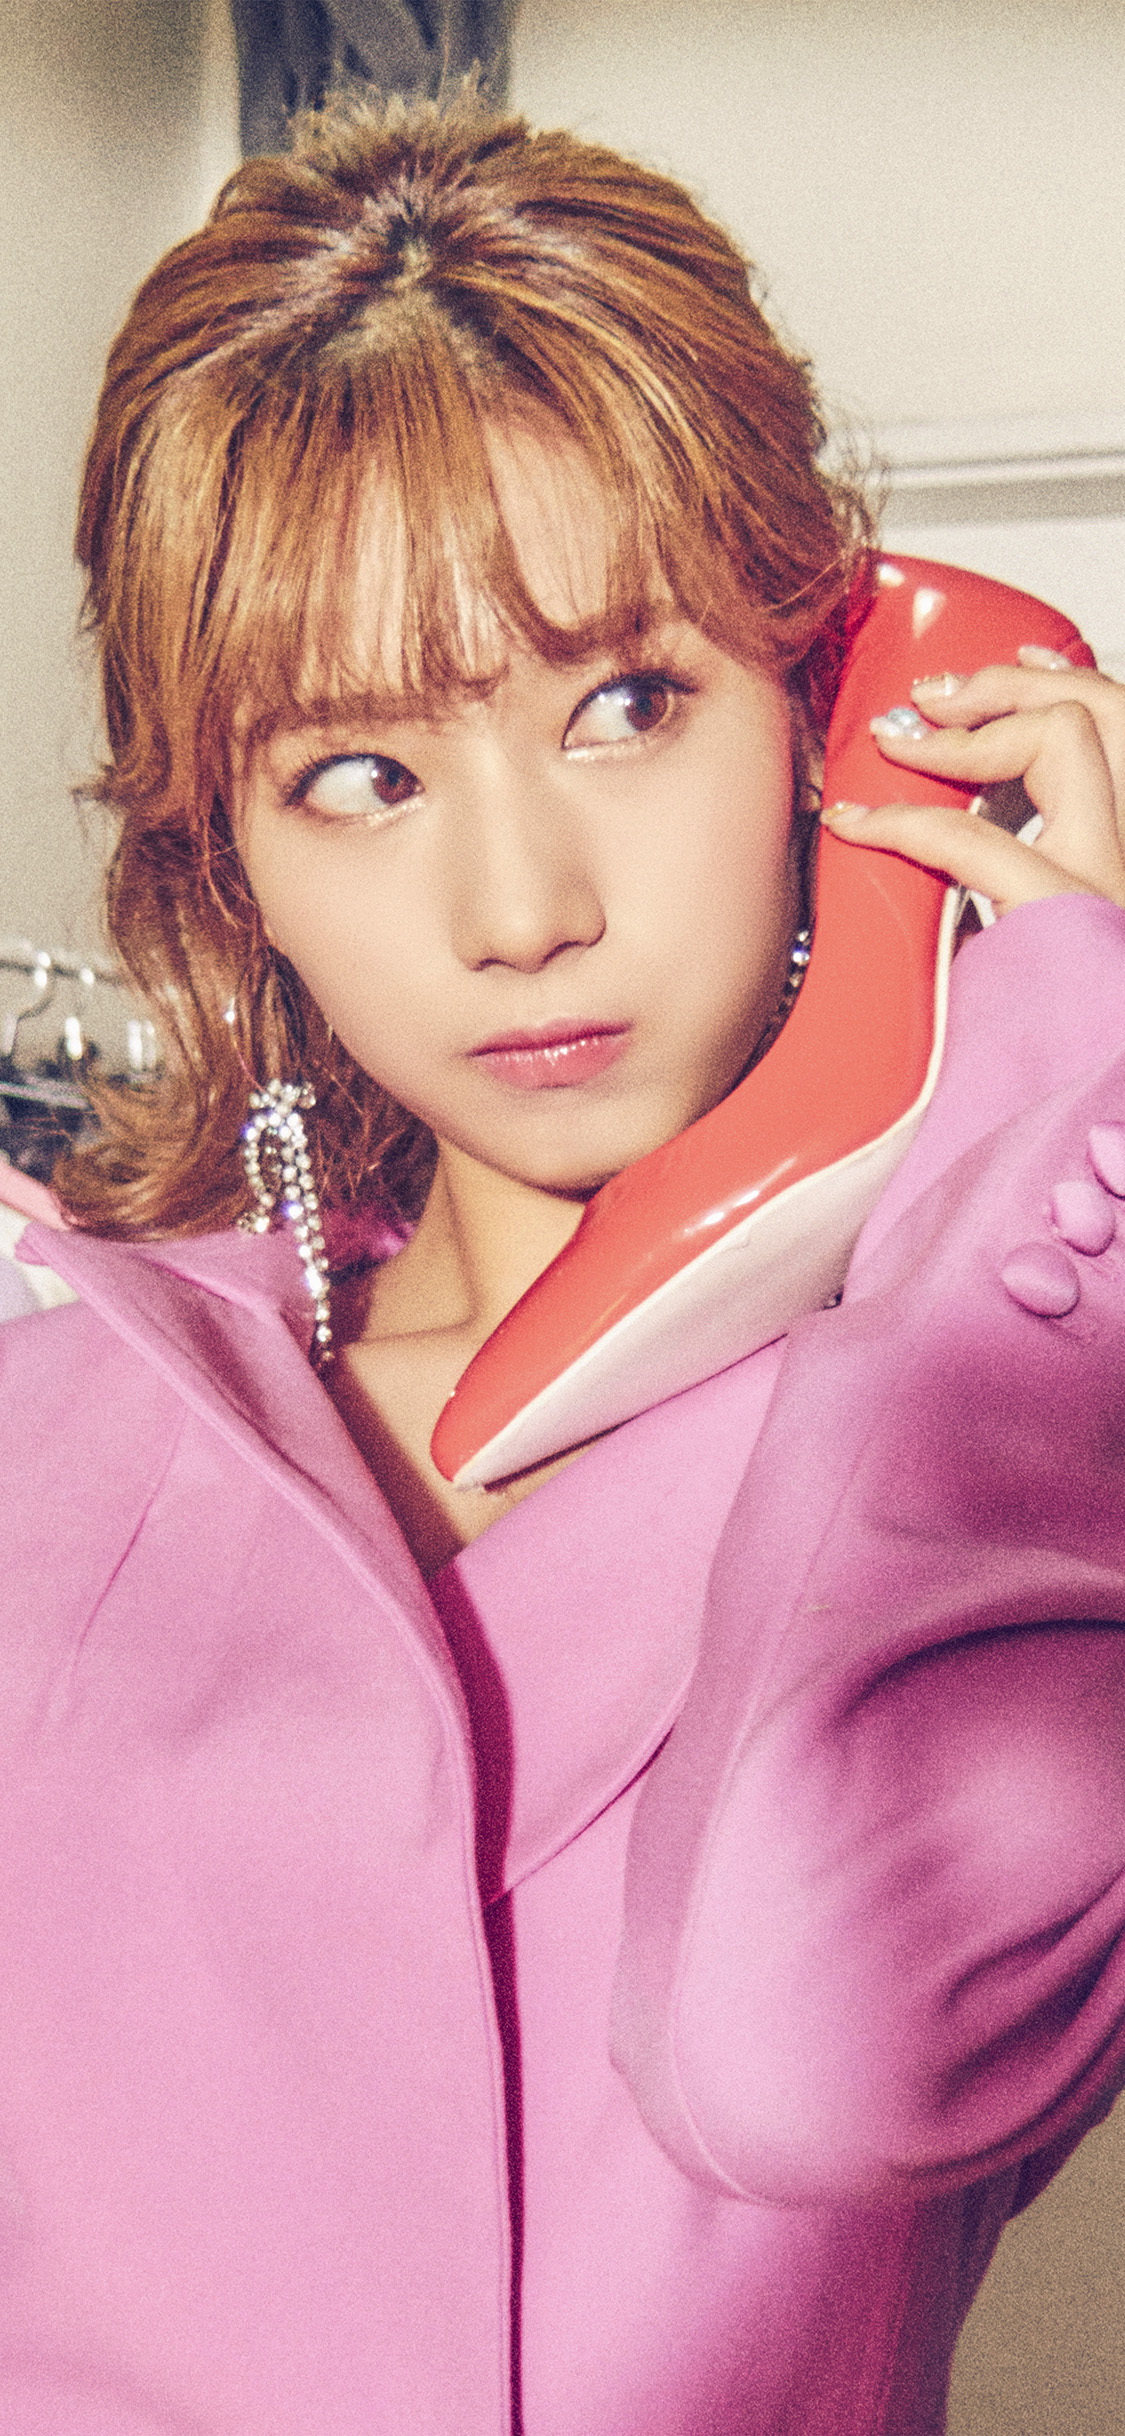 Iphonexpapers Com Iphone X Wallpaper Ho67 Girl Twice Sana Hello